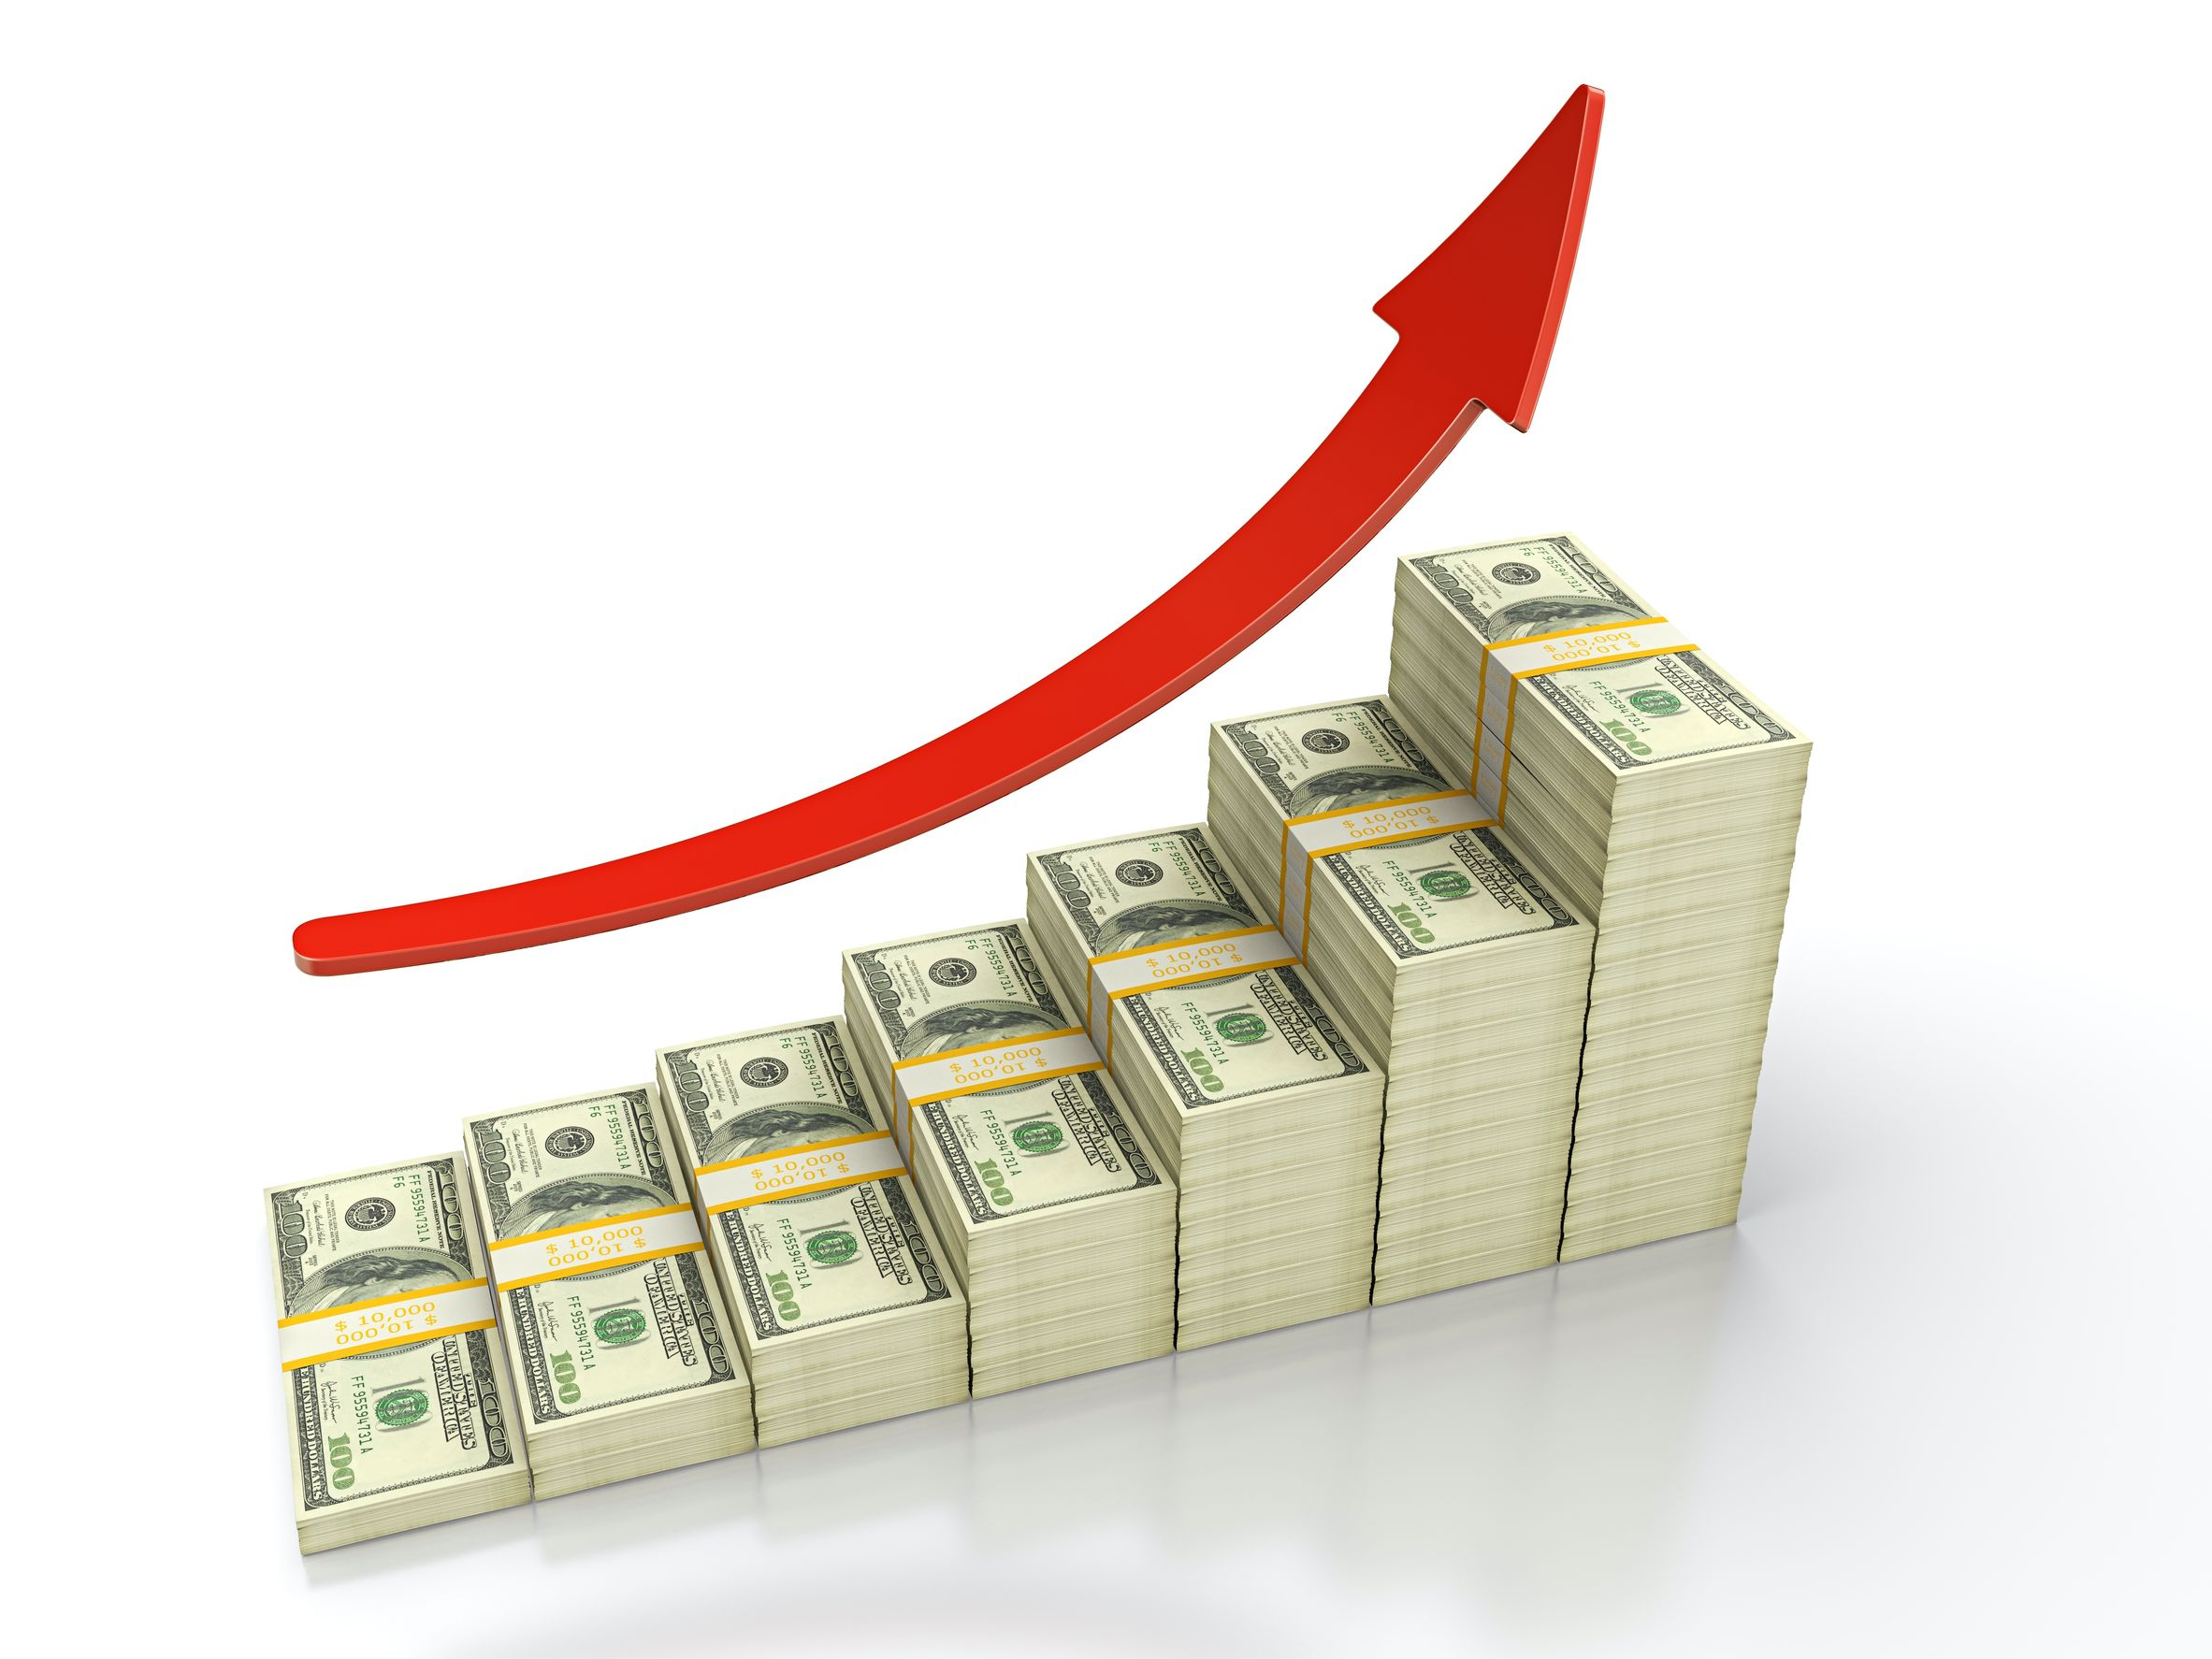 3d render of growing stack of dollar bills